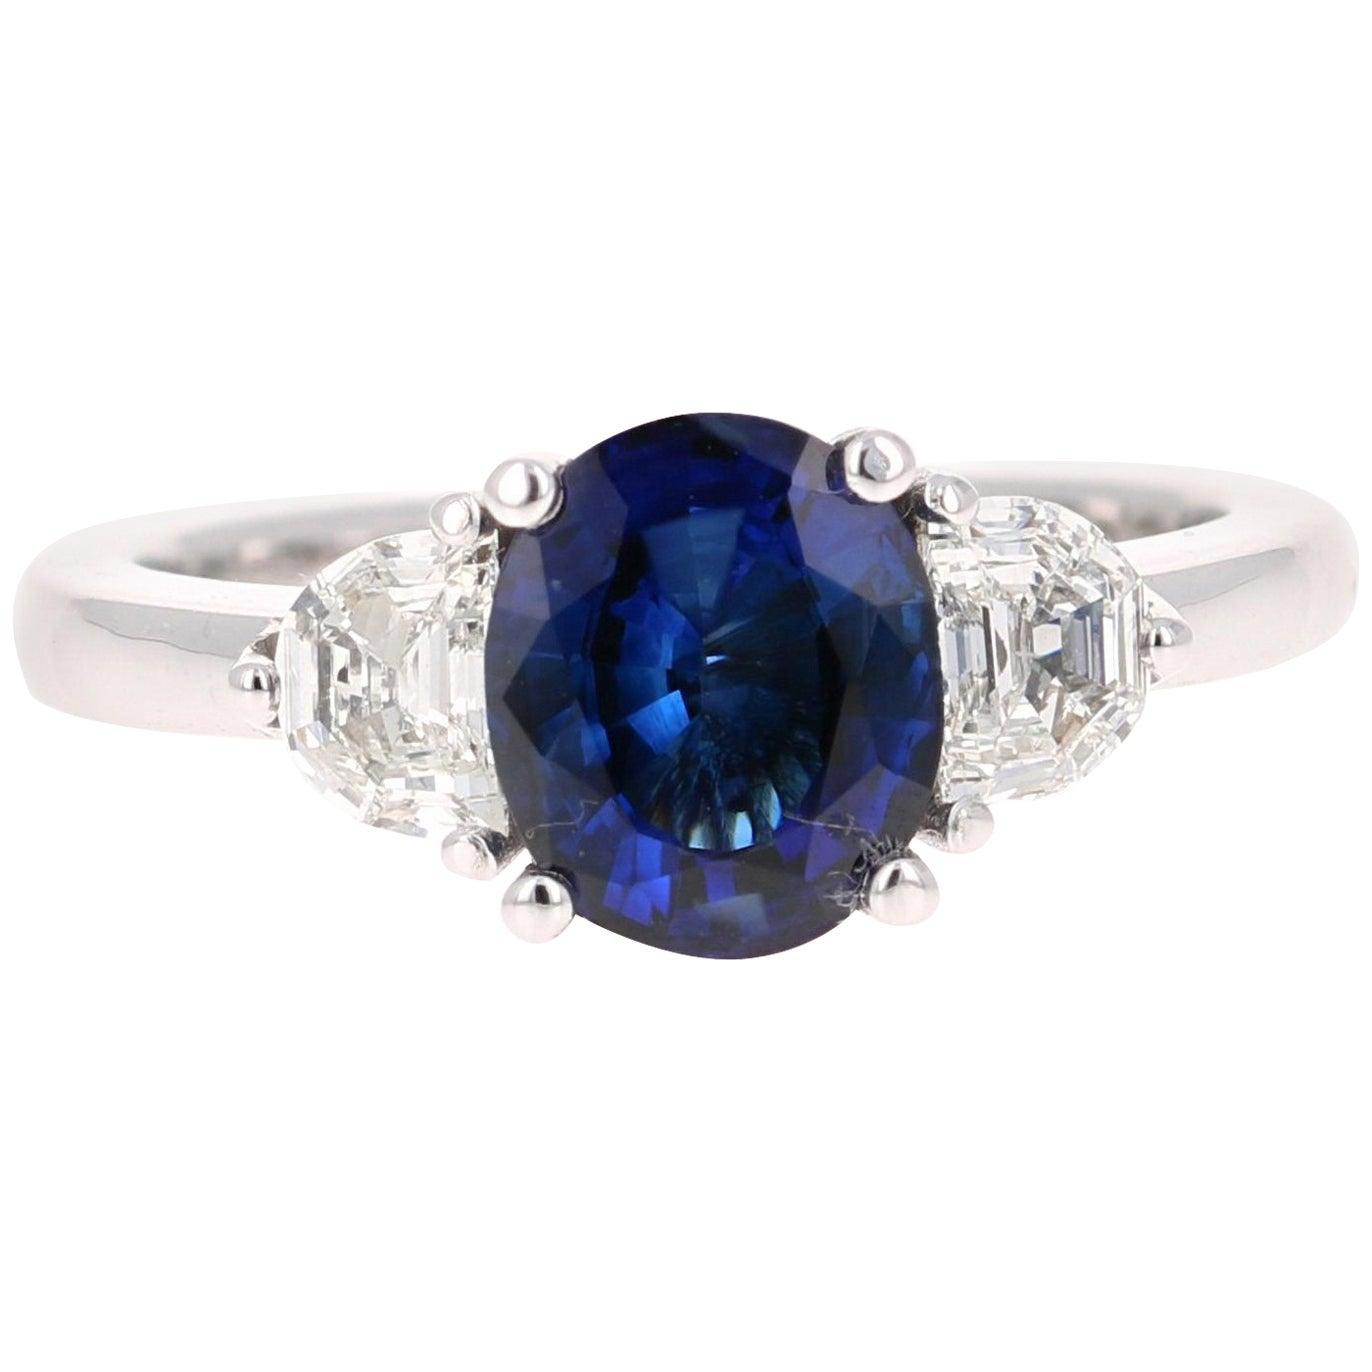 2.64 Carat GIA Certified Sapphire Diamond 18 Karat White Gold Three-Stone Ring